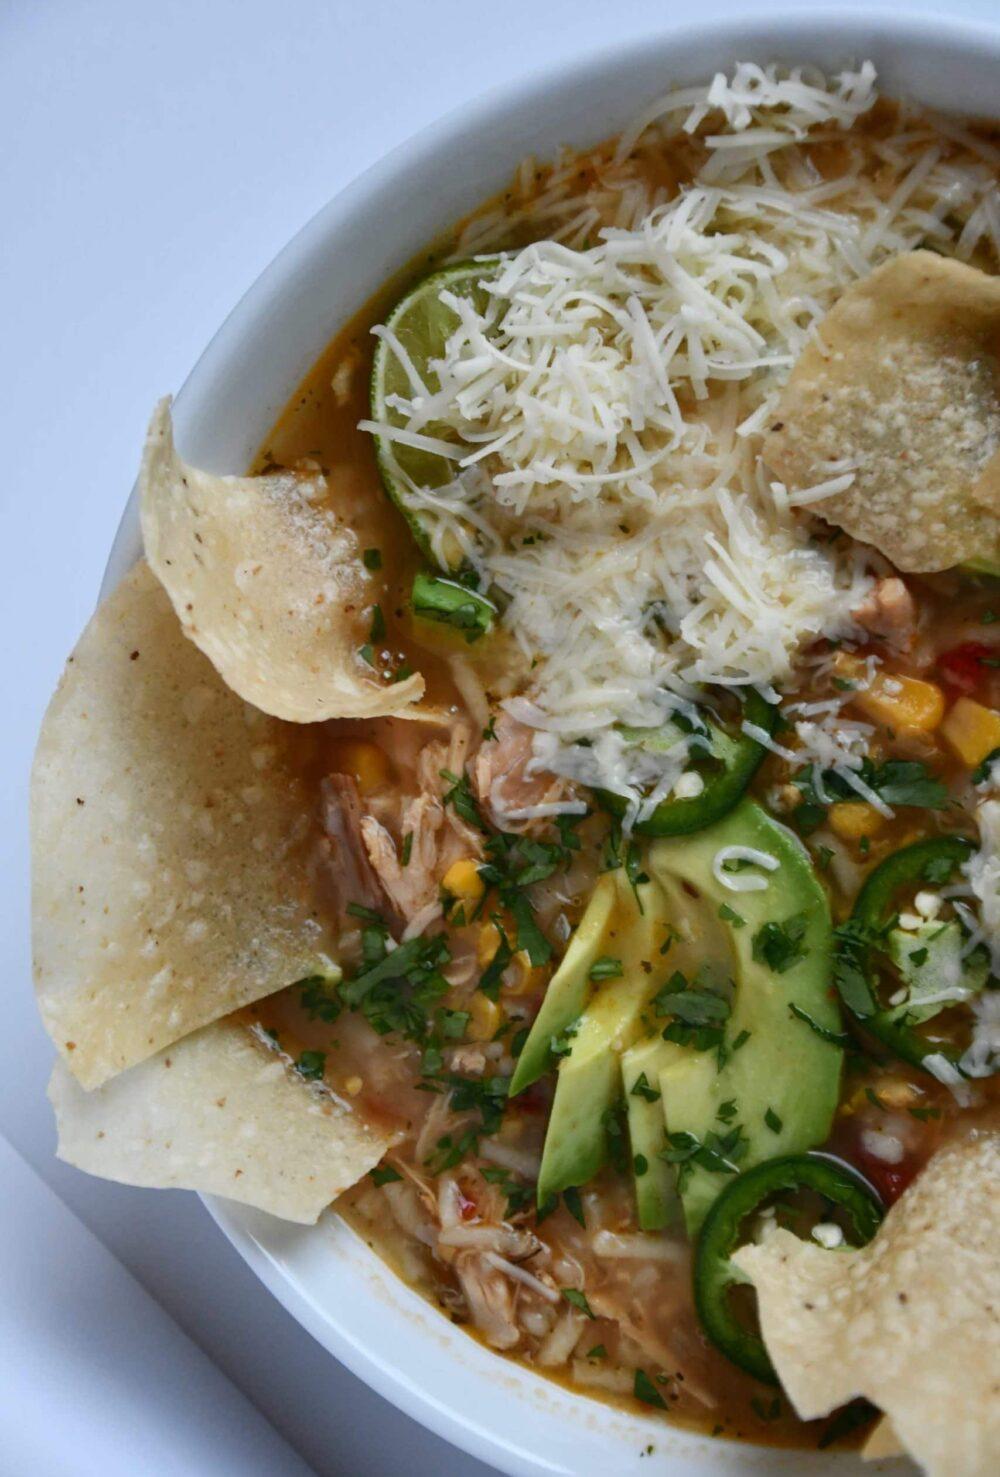 Joanna Gaines tortilla soup prepared by KendellKreations